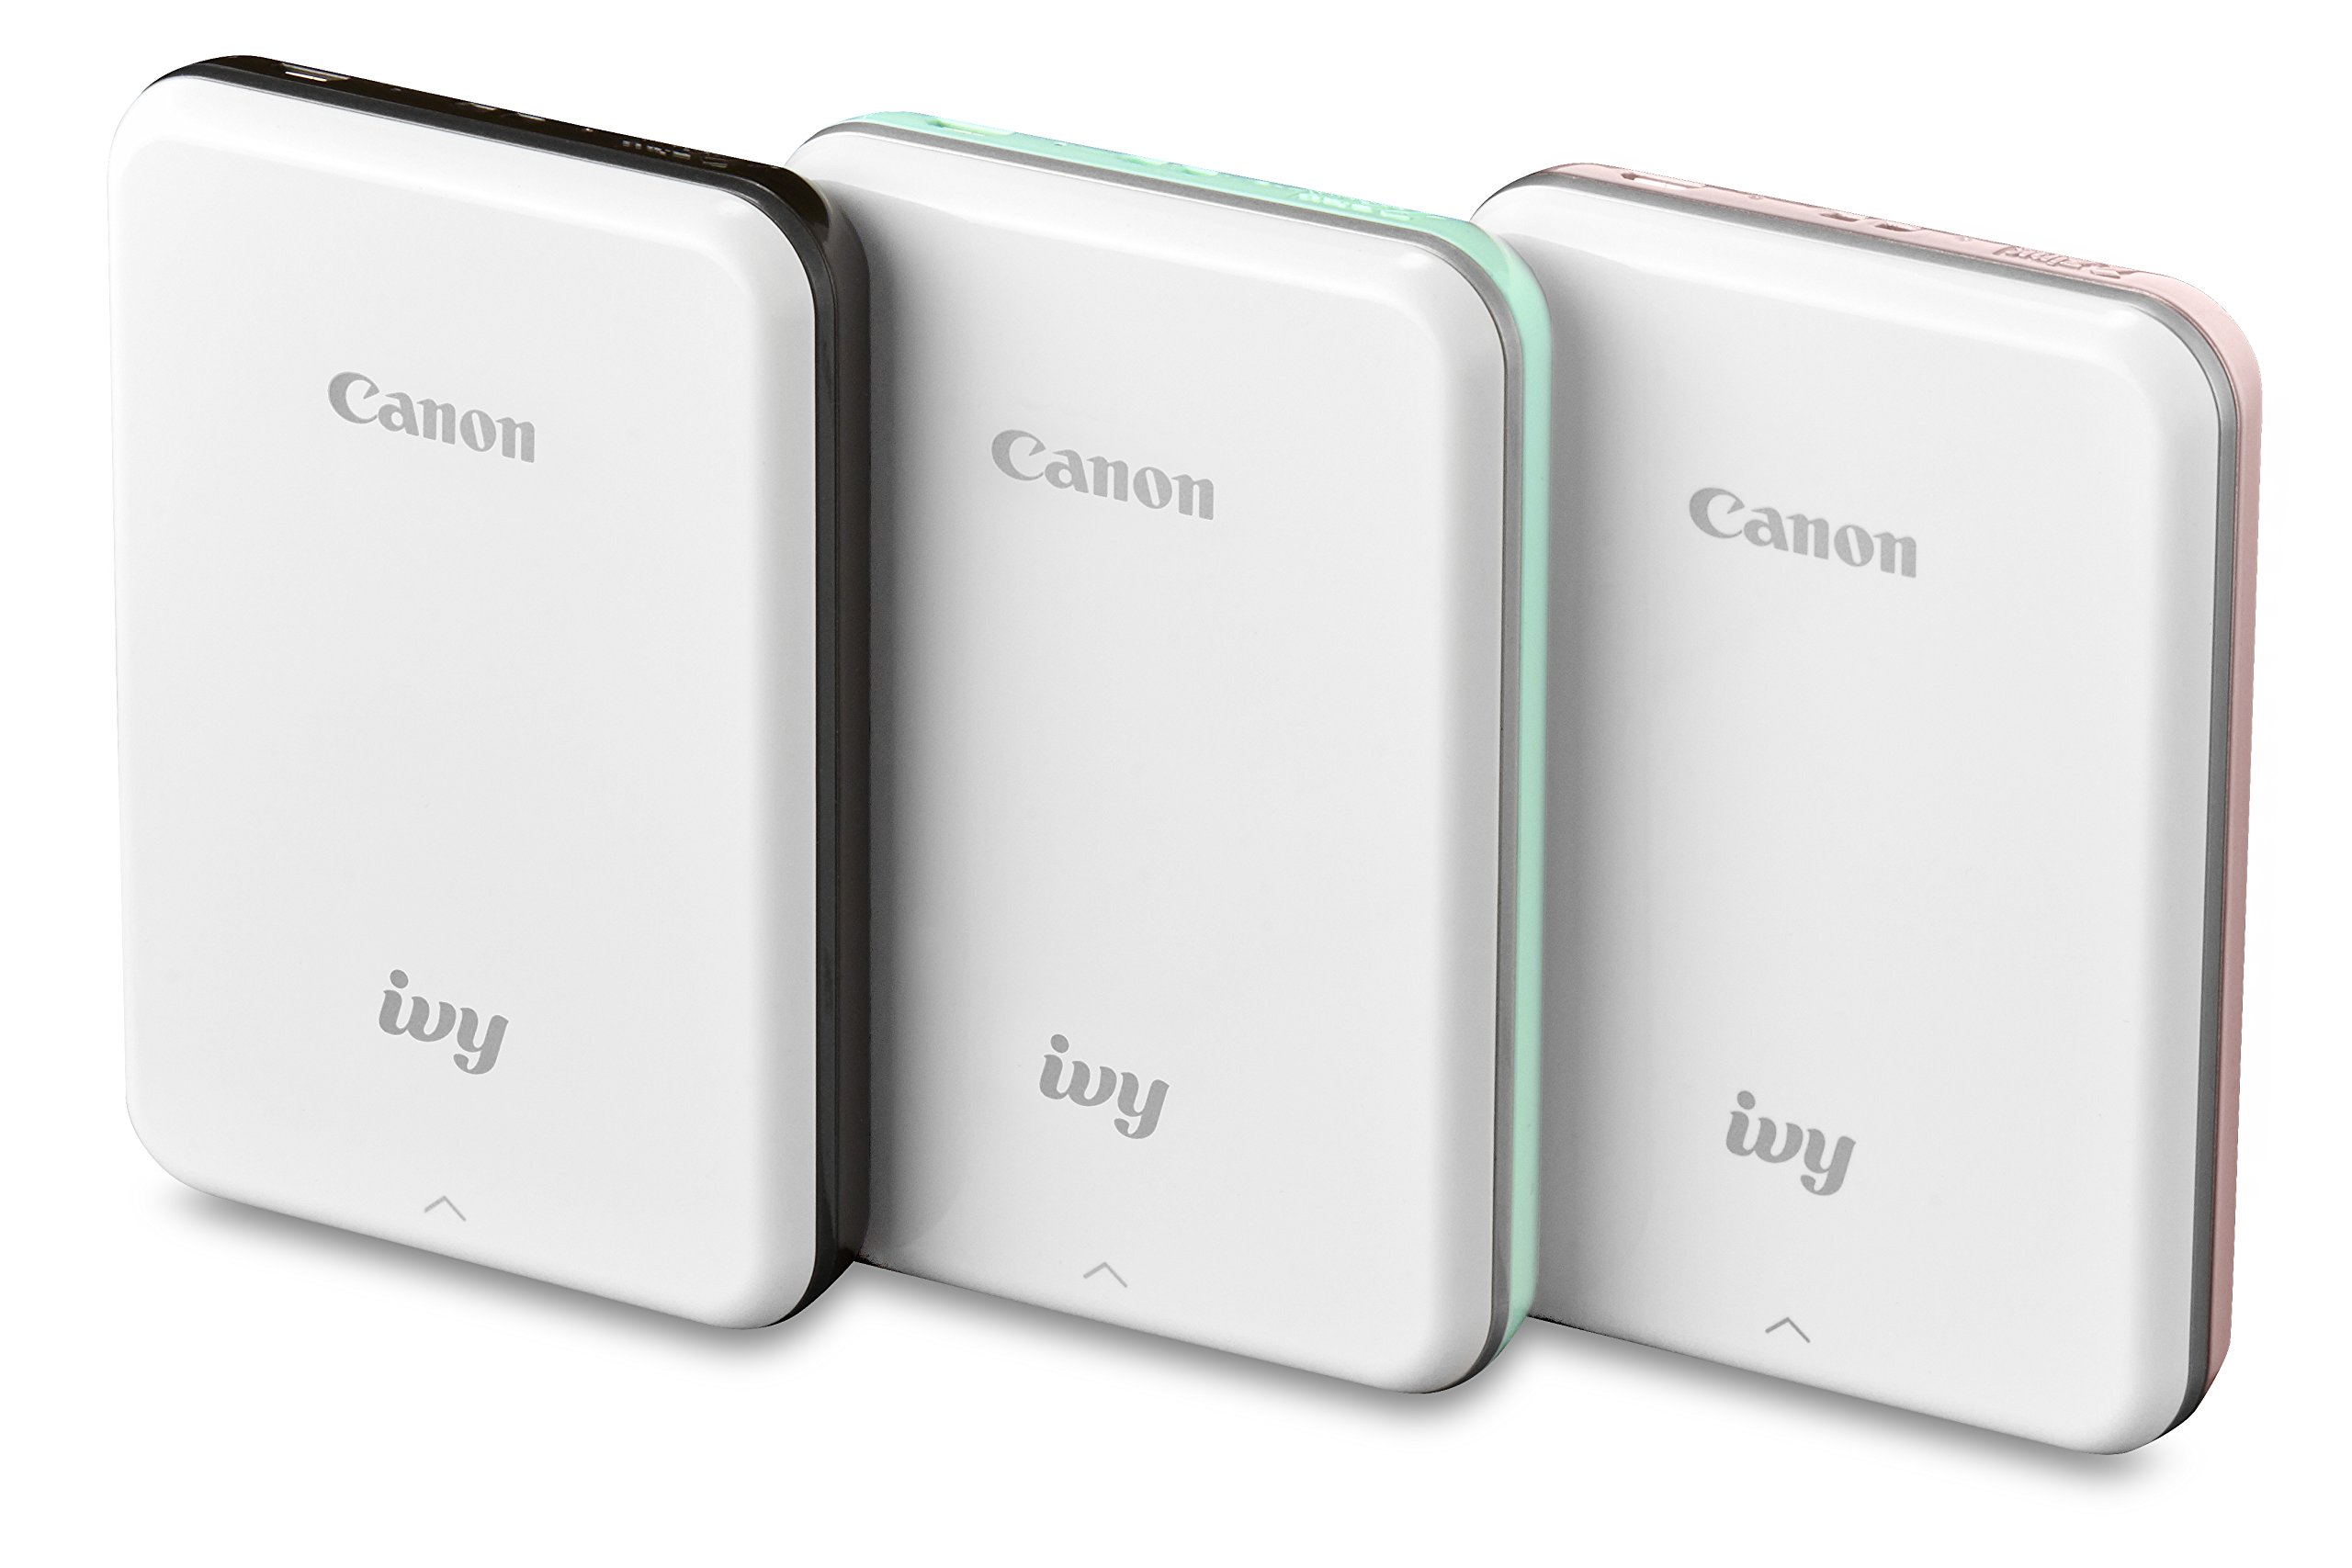 Canon IVY Mobile Mini Photo Printer through Bluetooth(R), Slate Gray by Canon (Image #7)